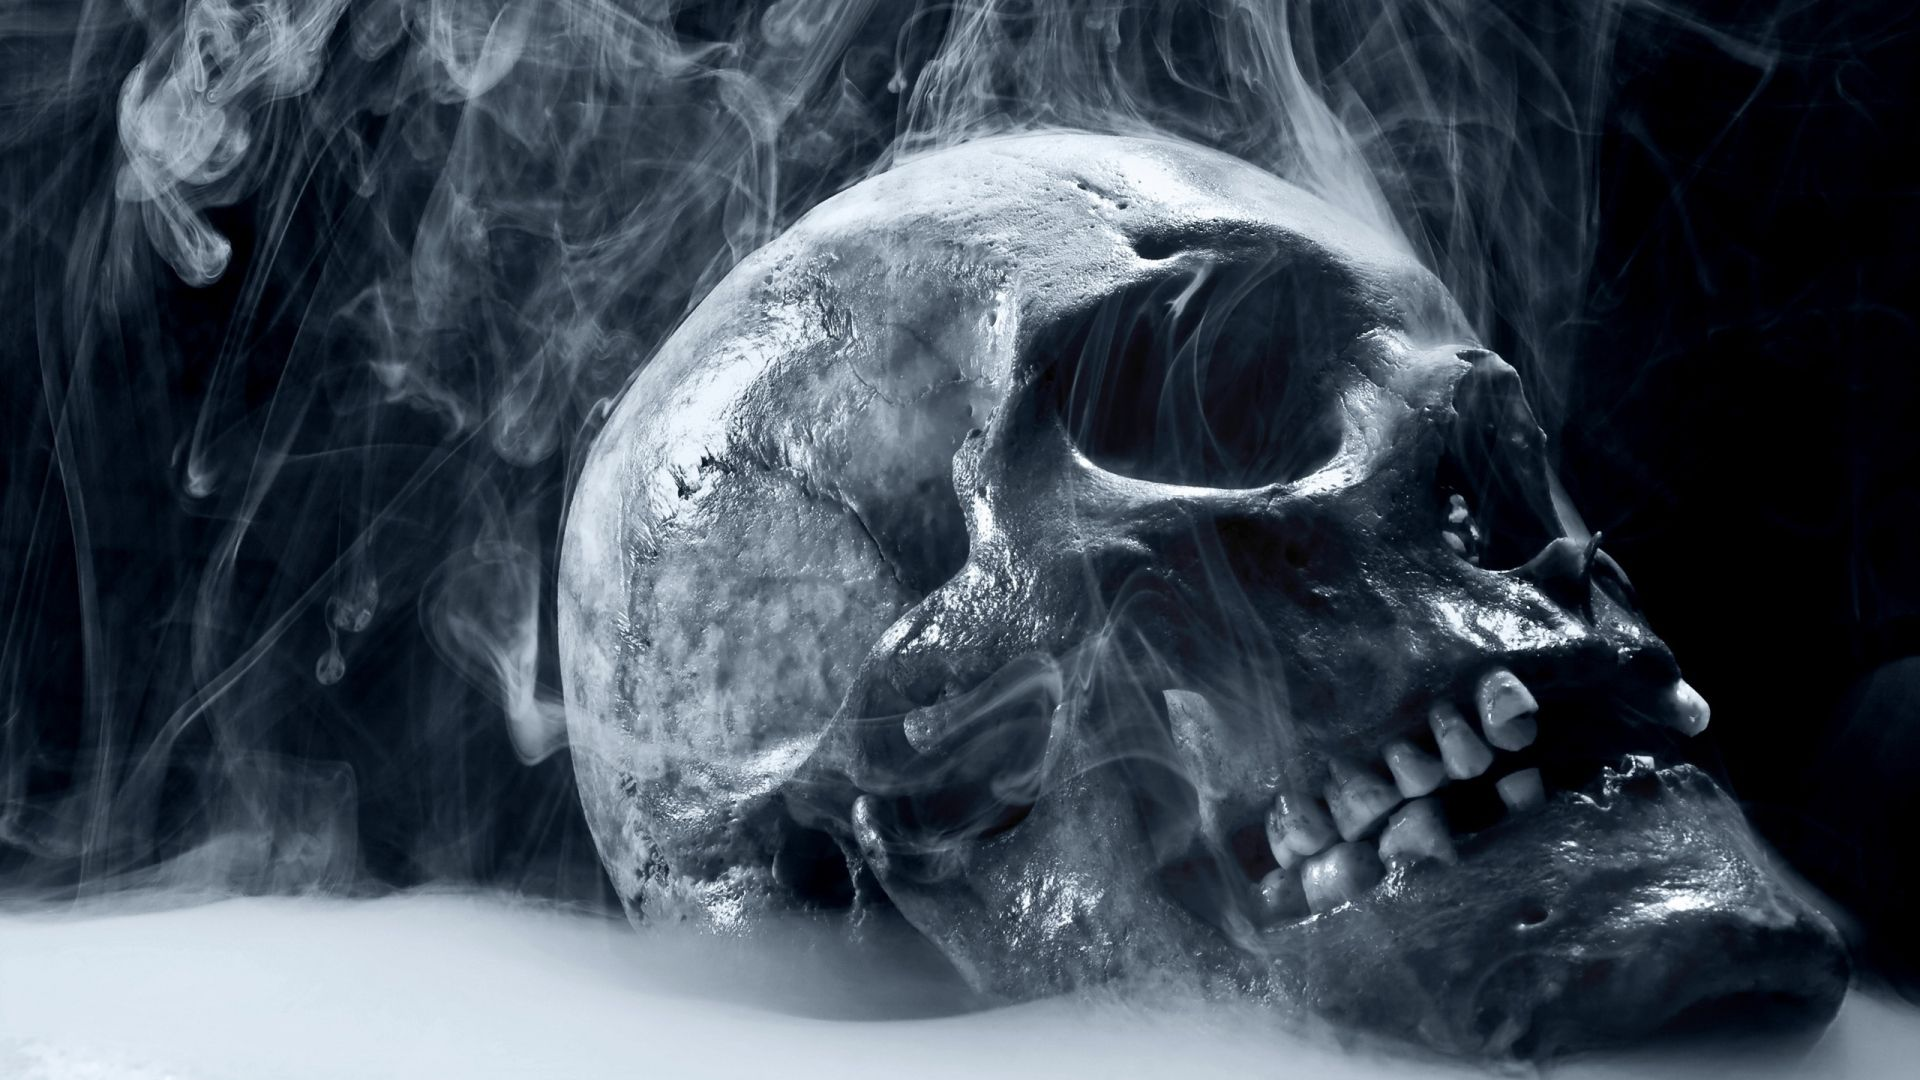 High Resolution Smoke Photography Skull HD Wallpaper